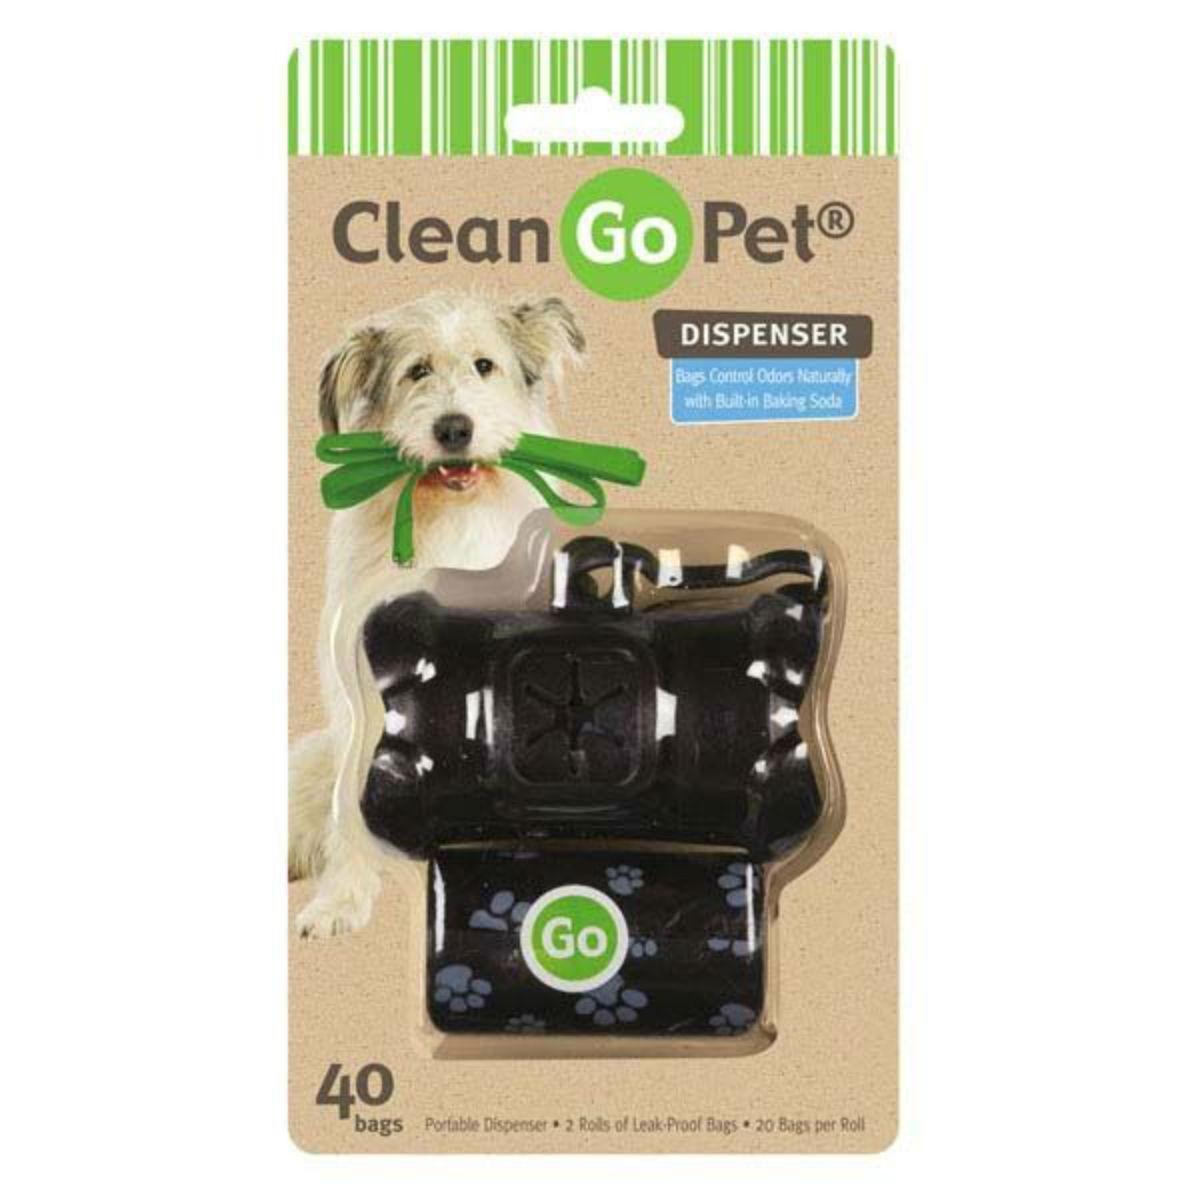 Clean Go Pet Bone Waste Bag Holders - Black at BaxterBoo.com